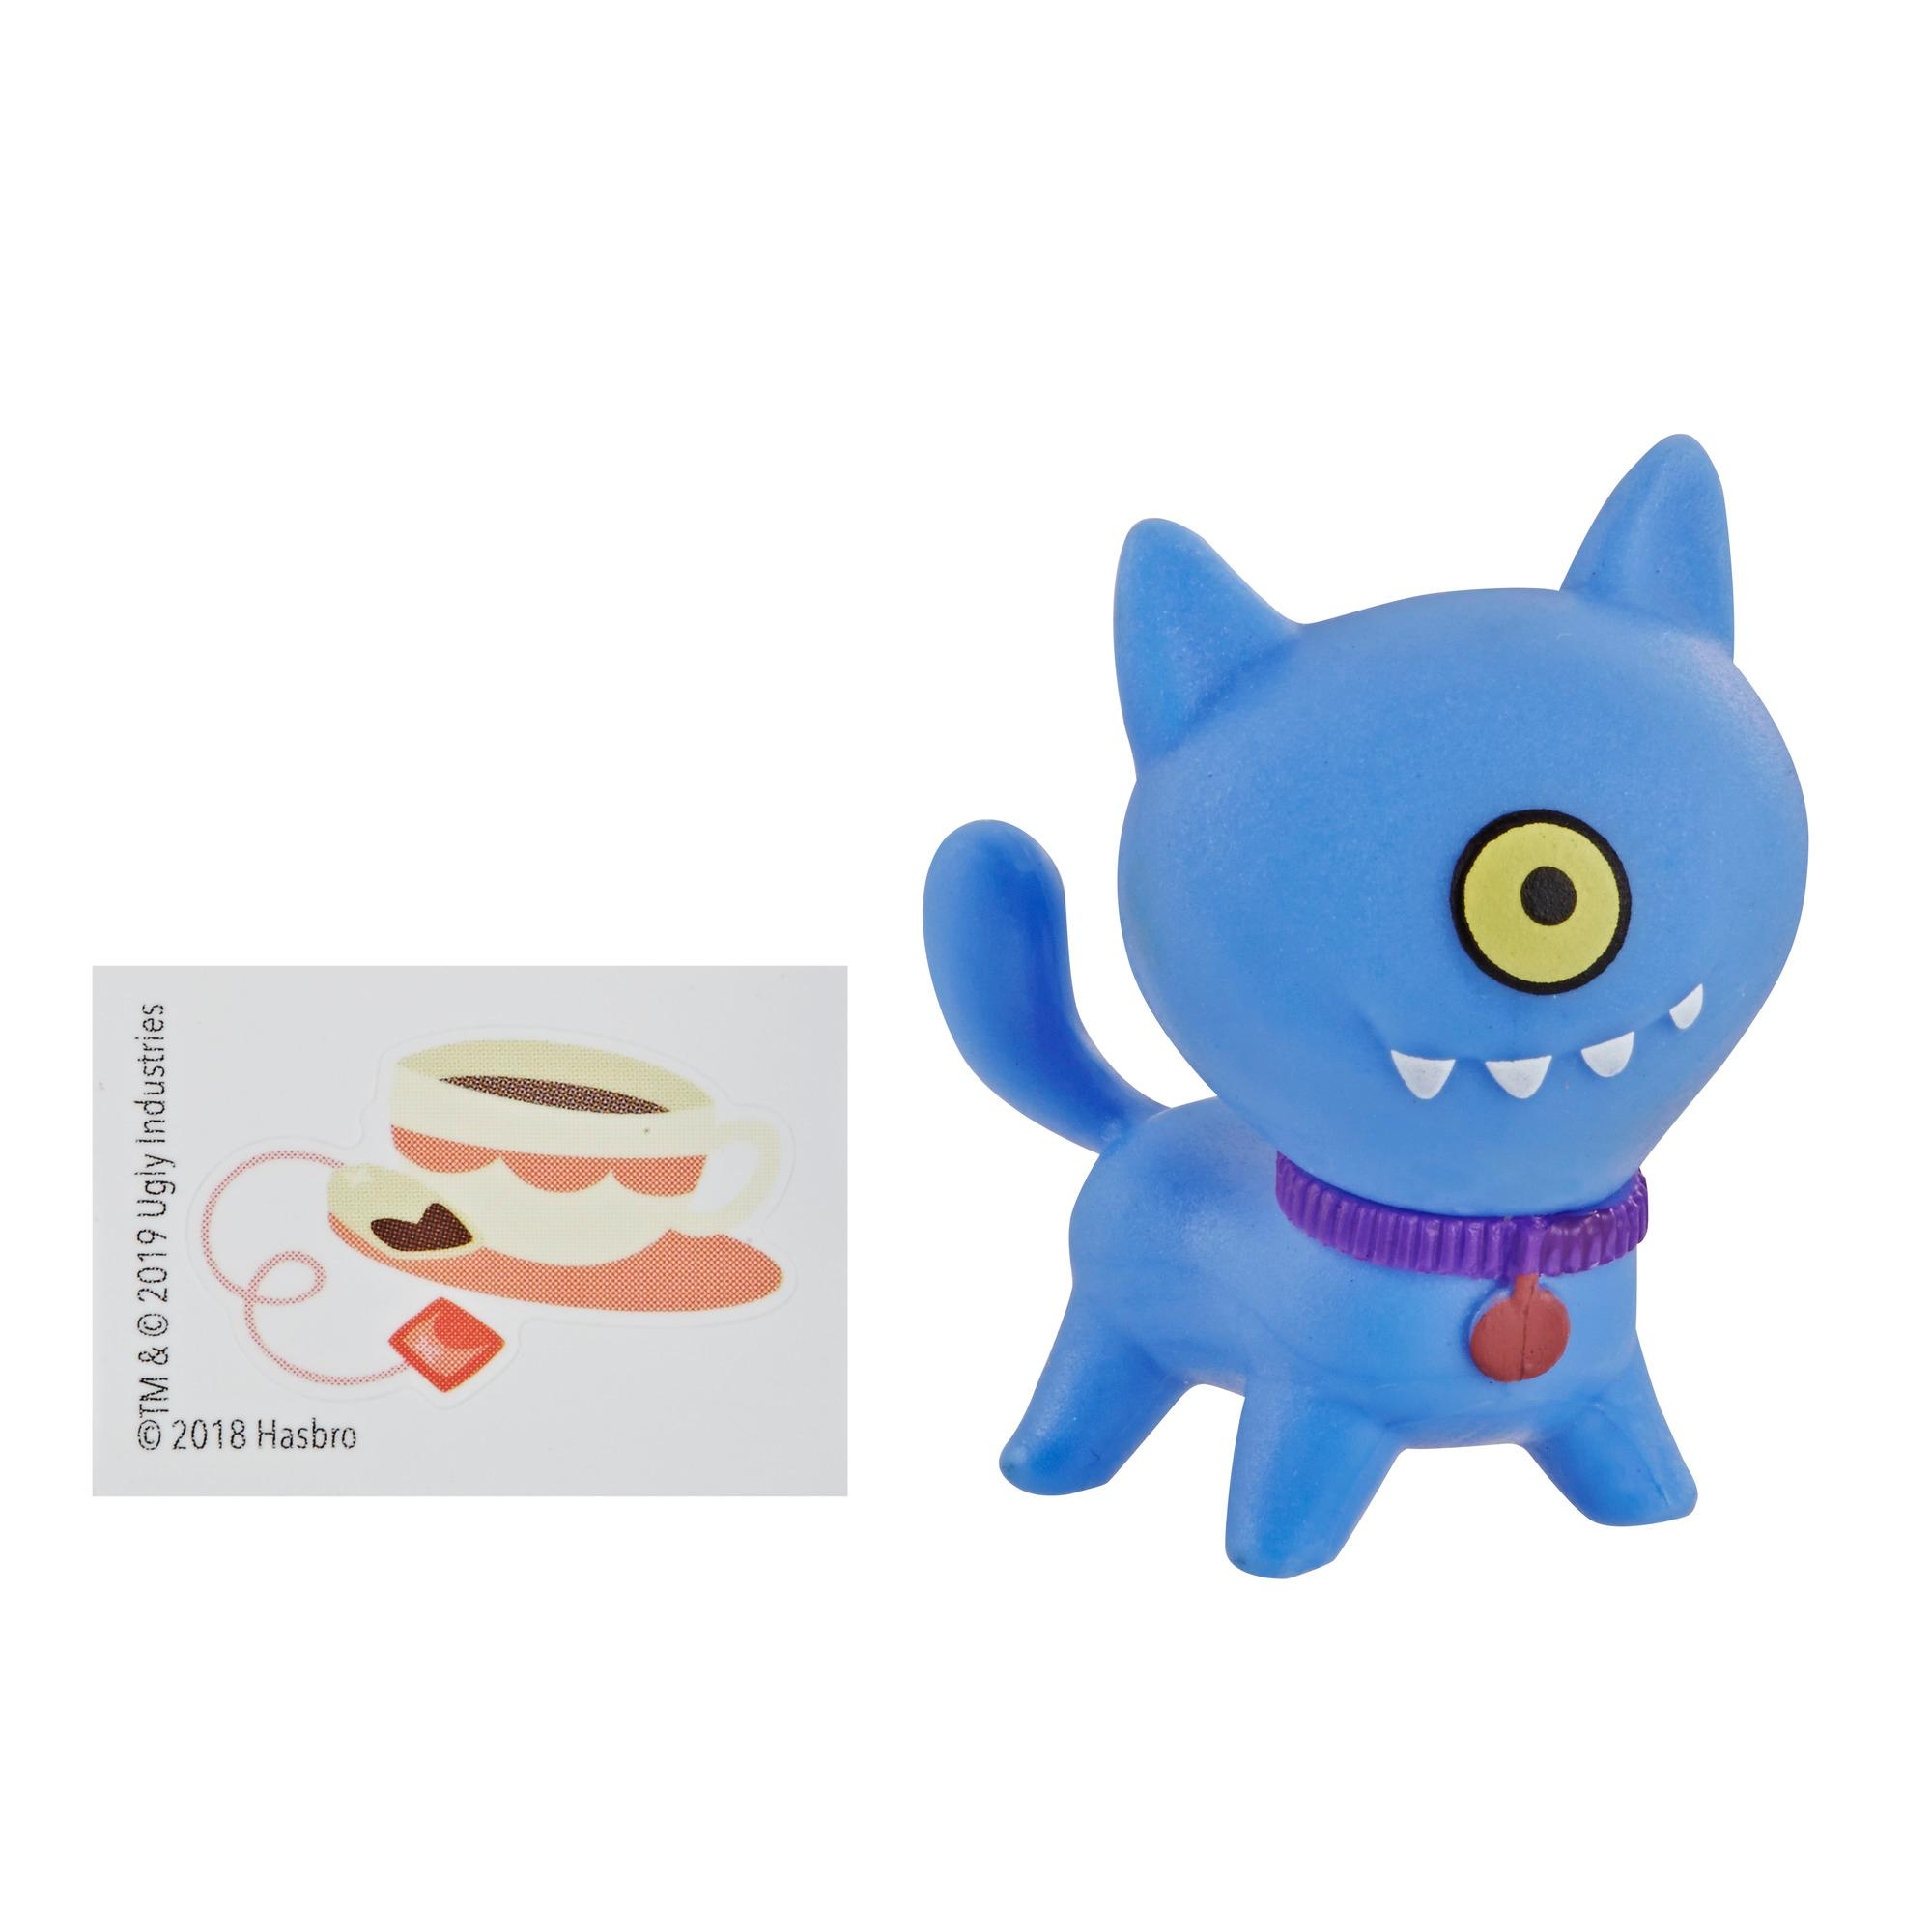 UglyDolls Lotsa Ugly Mini Figures Series 1, 4 Accessories